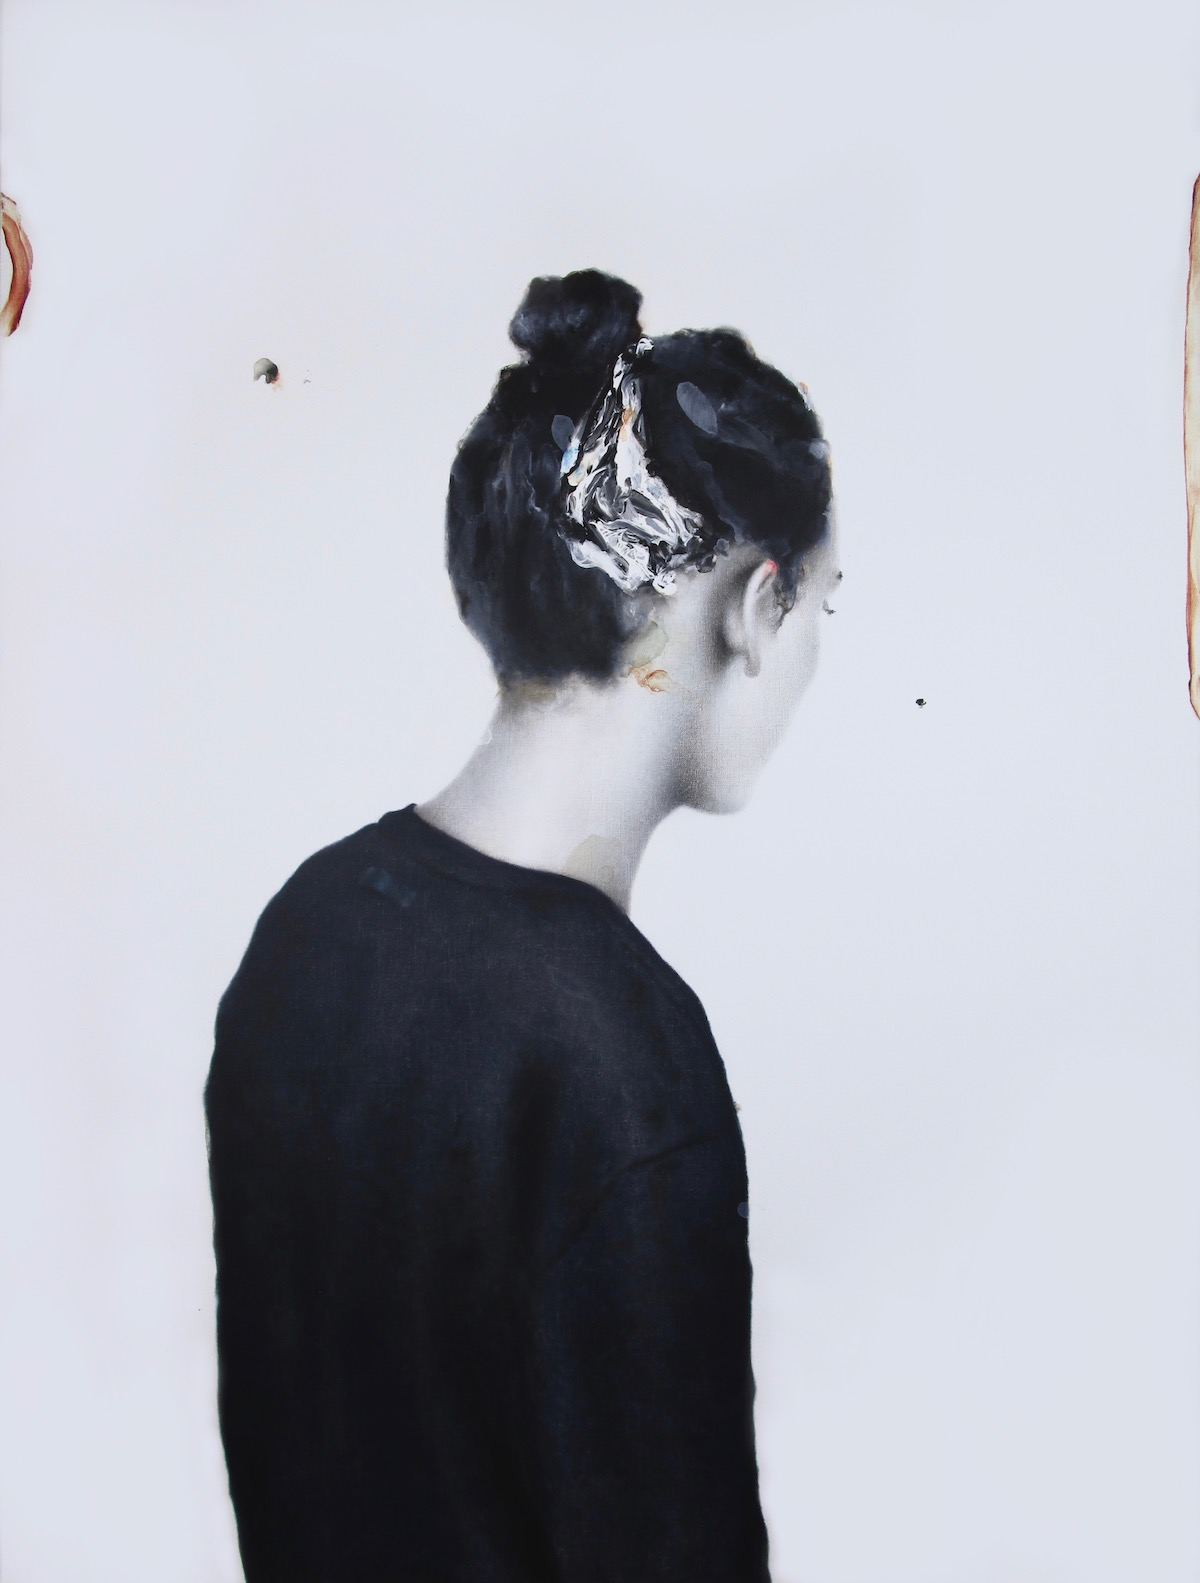 antoine cordet canvas toile peinture painting portrait art artist artiste peintre acrylic oil all around your body